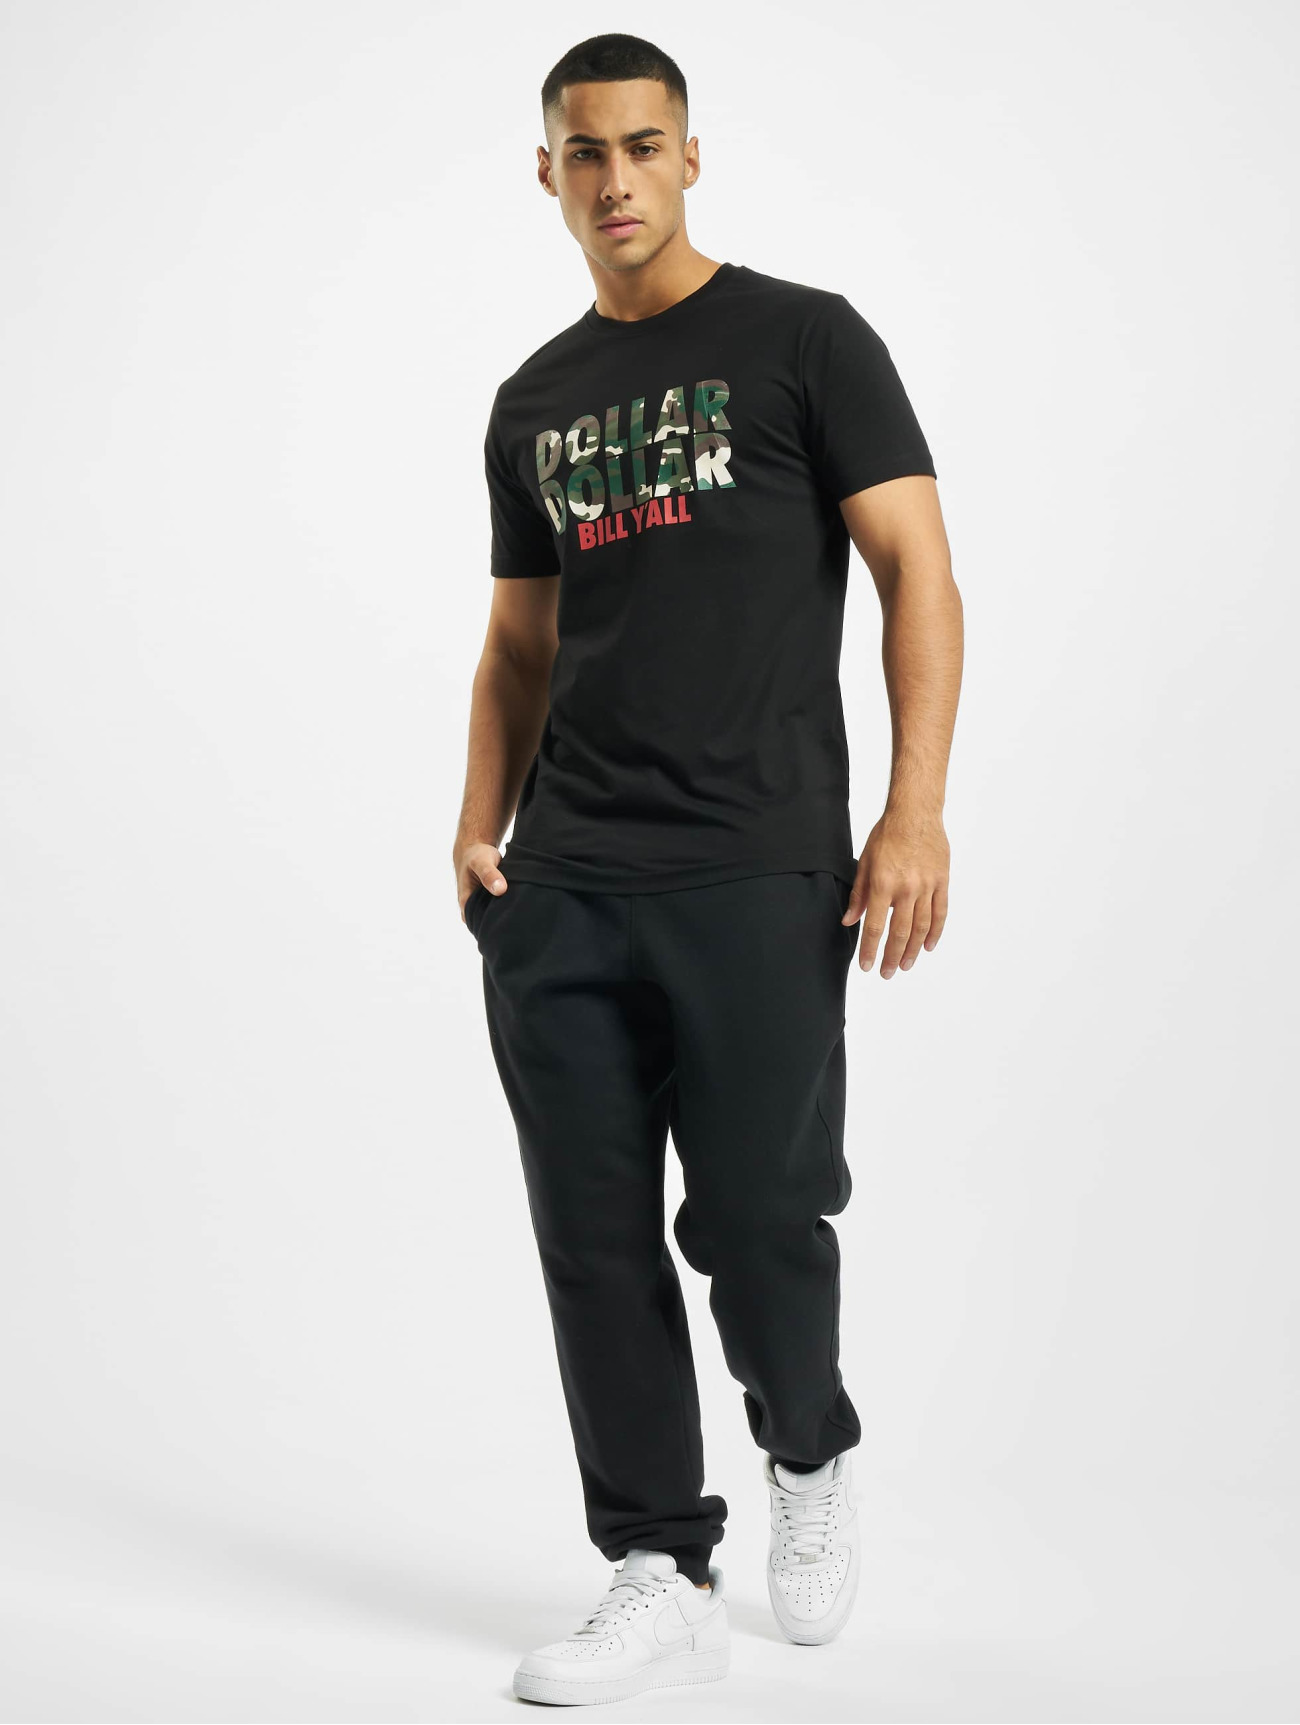 Mister Tee | Dollar   noir Homme T-Shirt  398234| Homme Hauts